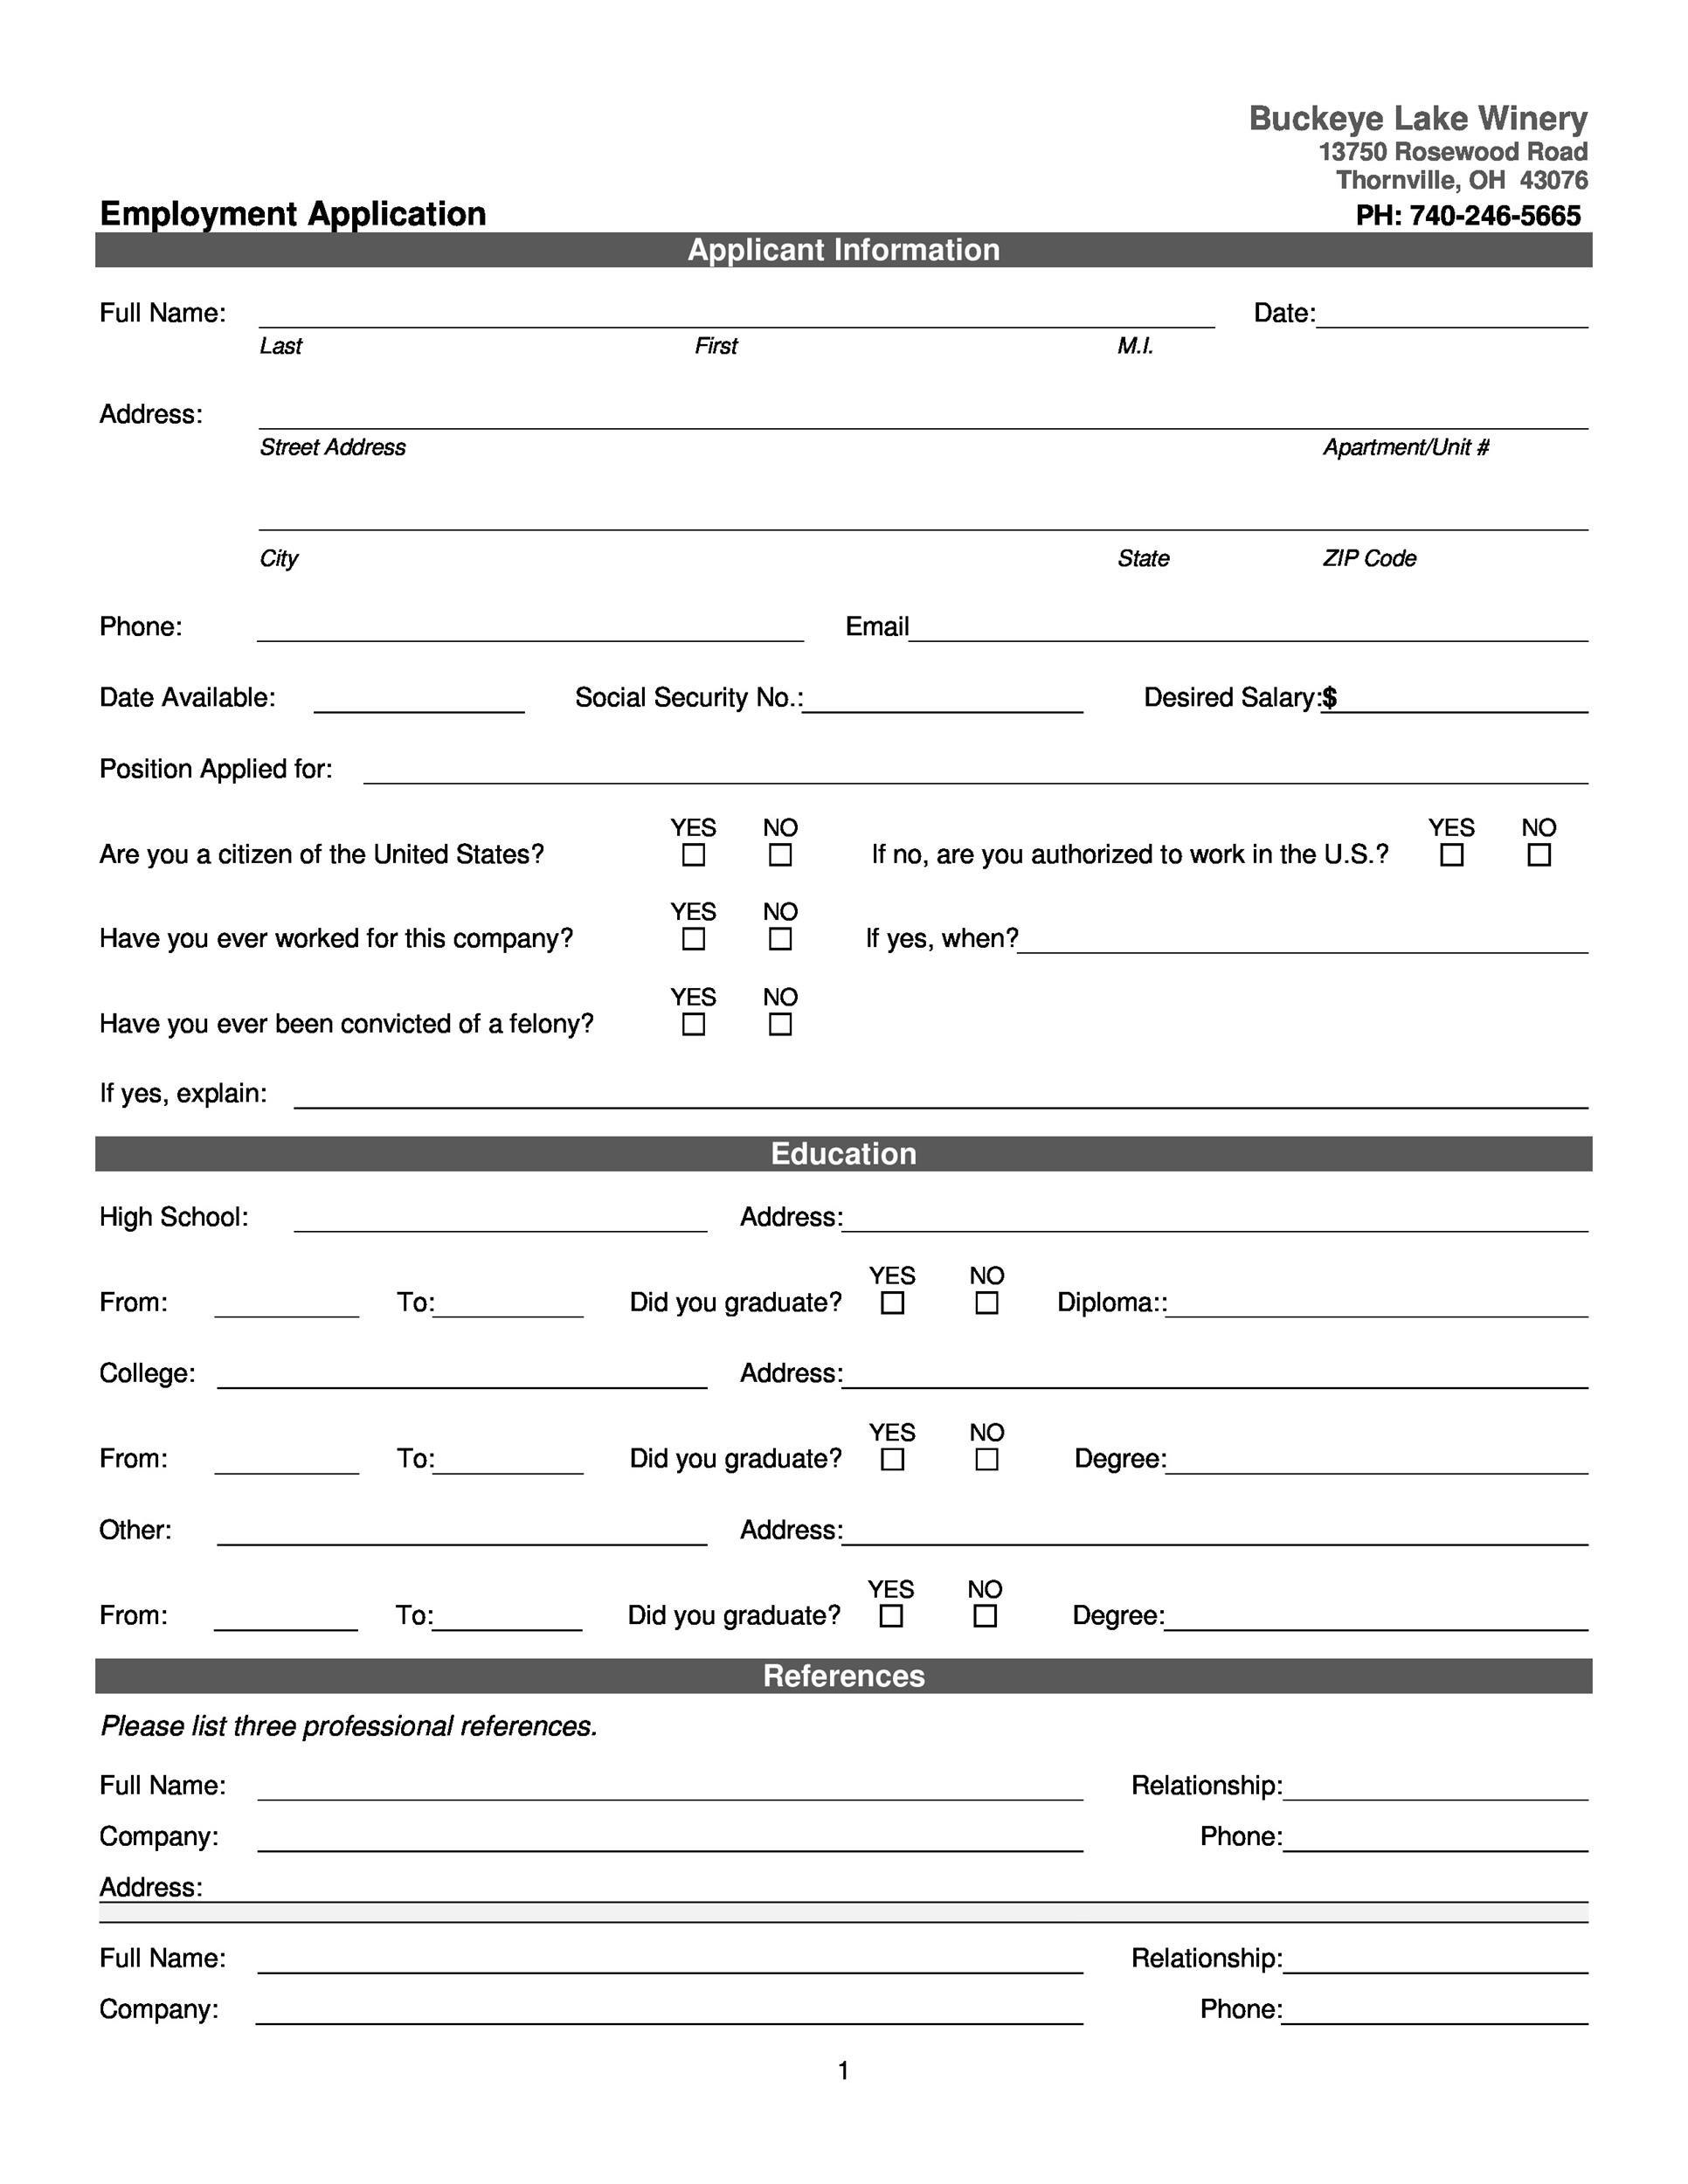 Free Printable Employment Application